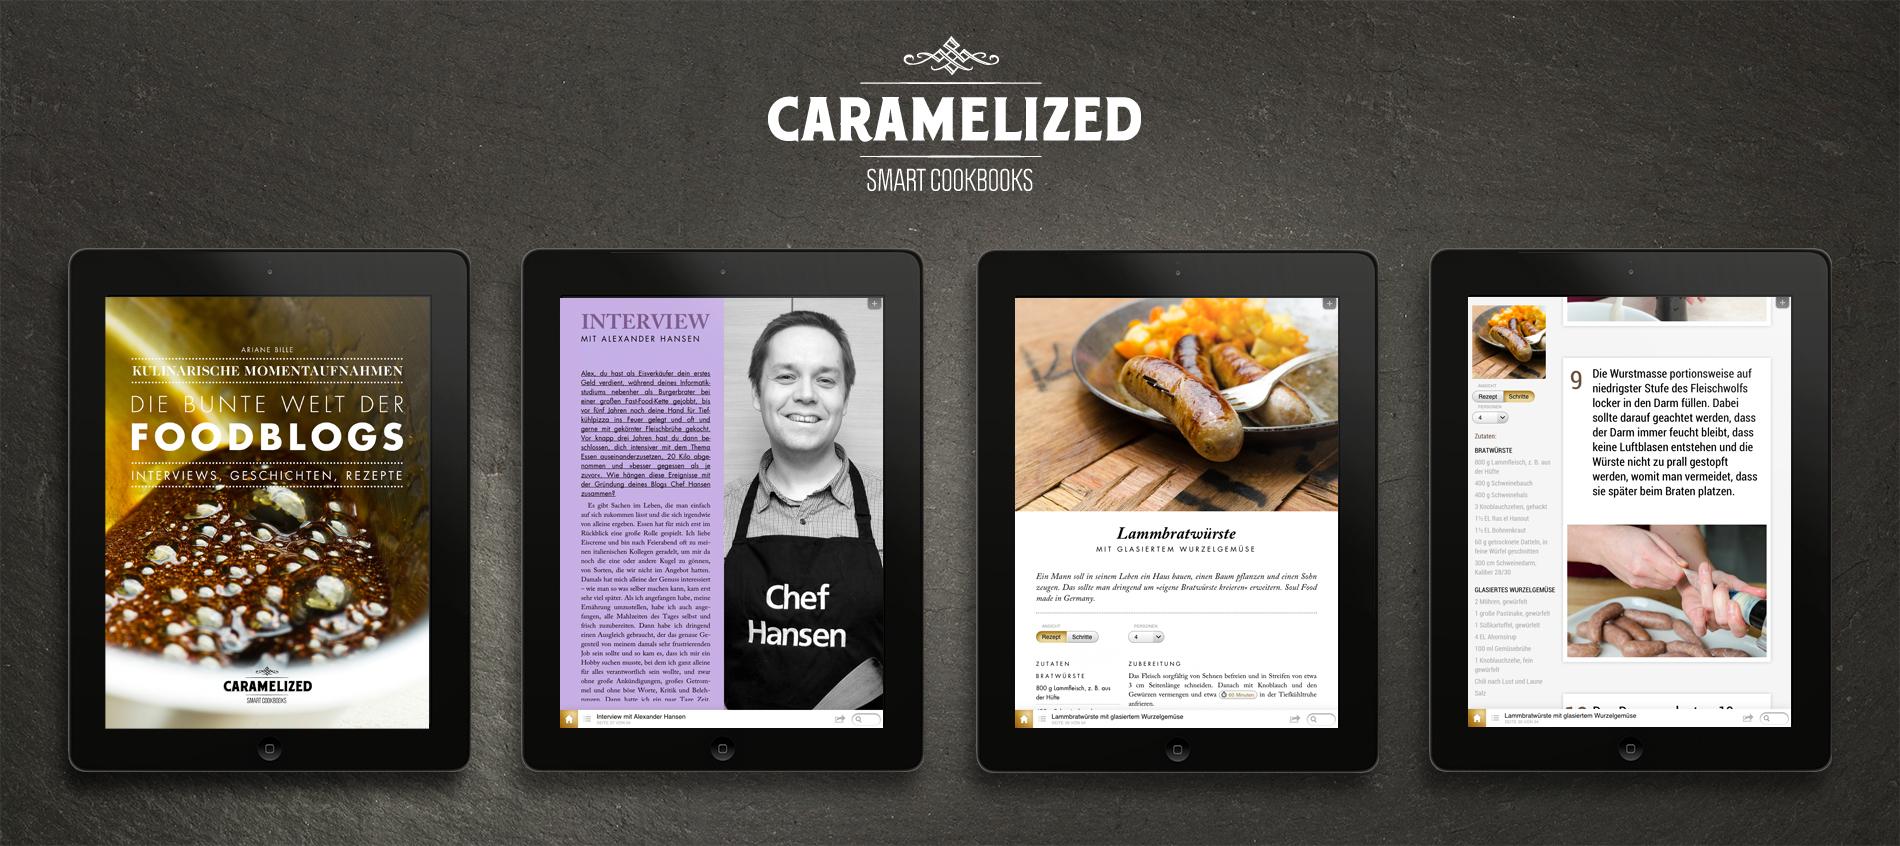 km-app-caramelized©arianebile